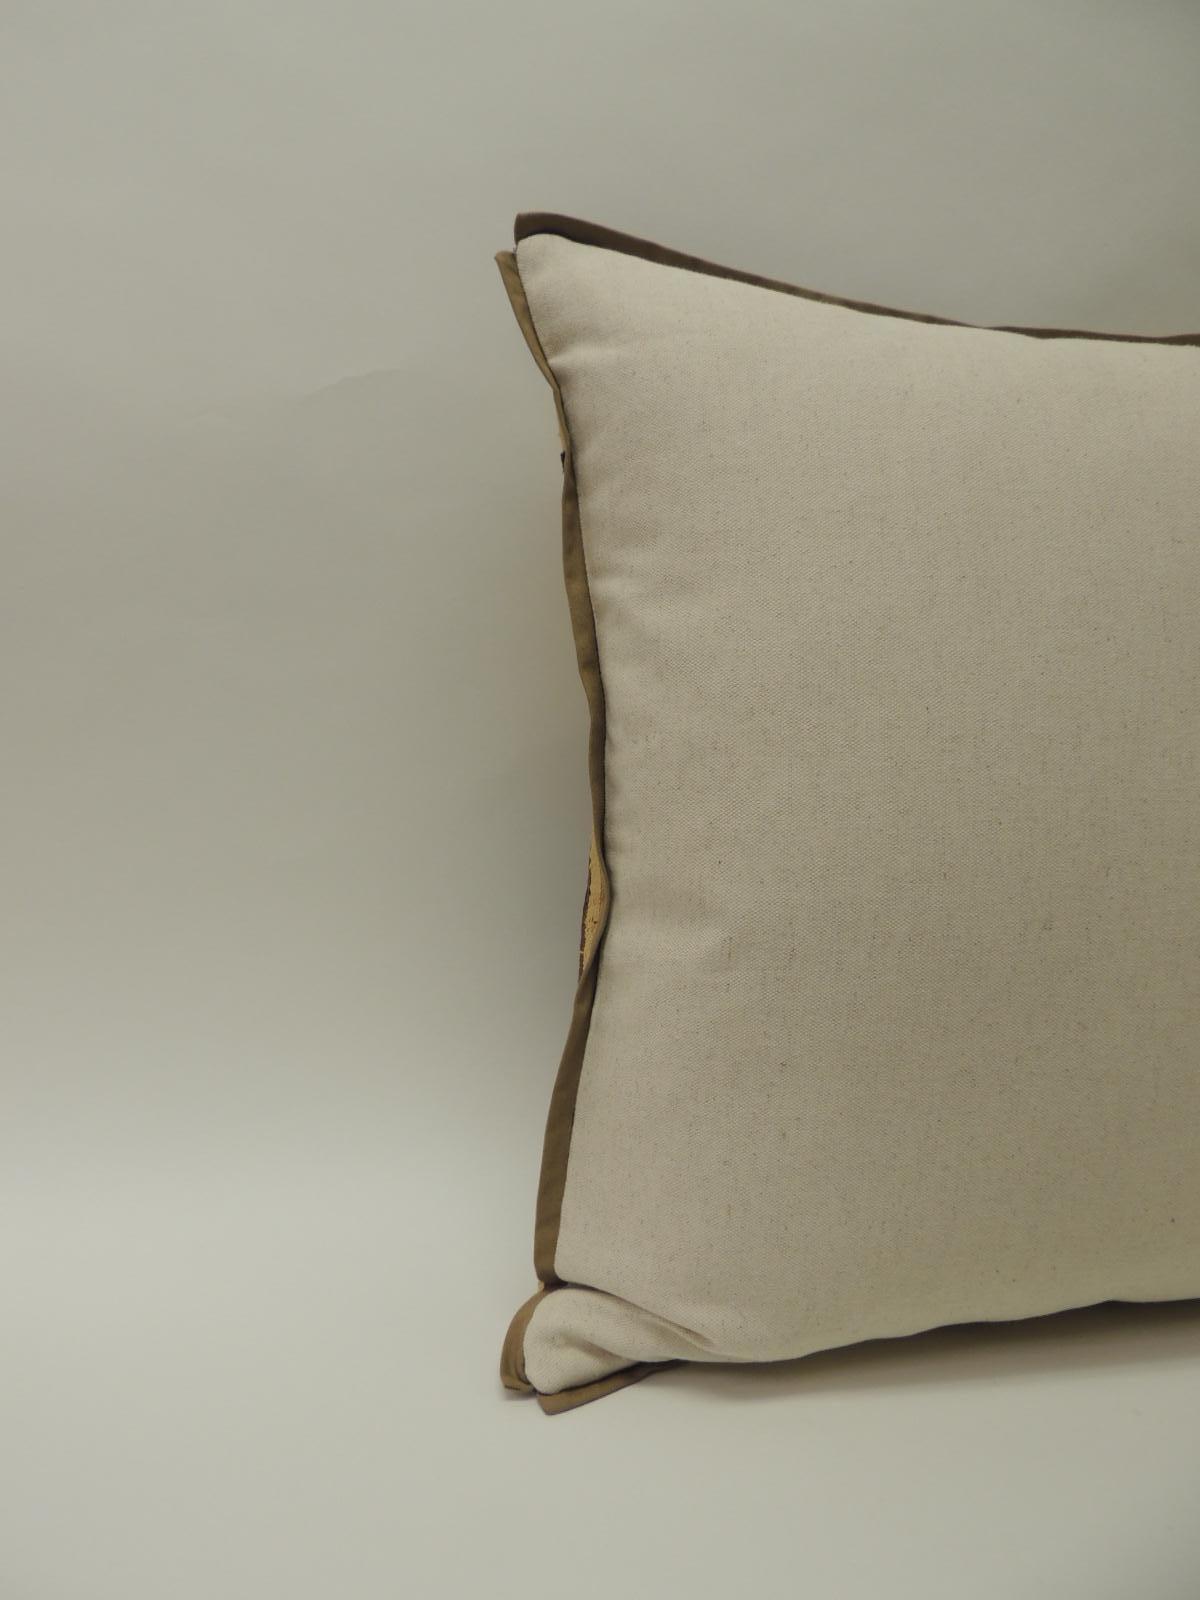 Applique Raffia Brown And Black Kuba Decorative Pillows Matisse Style